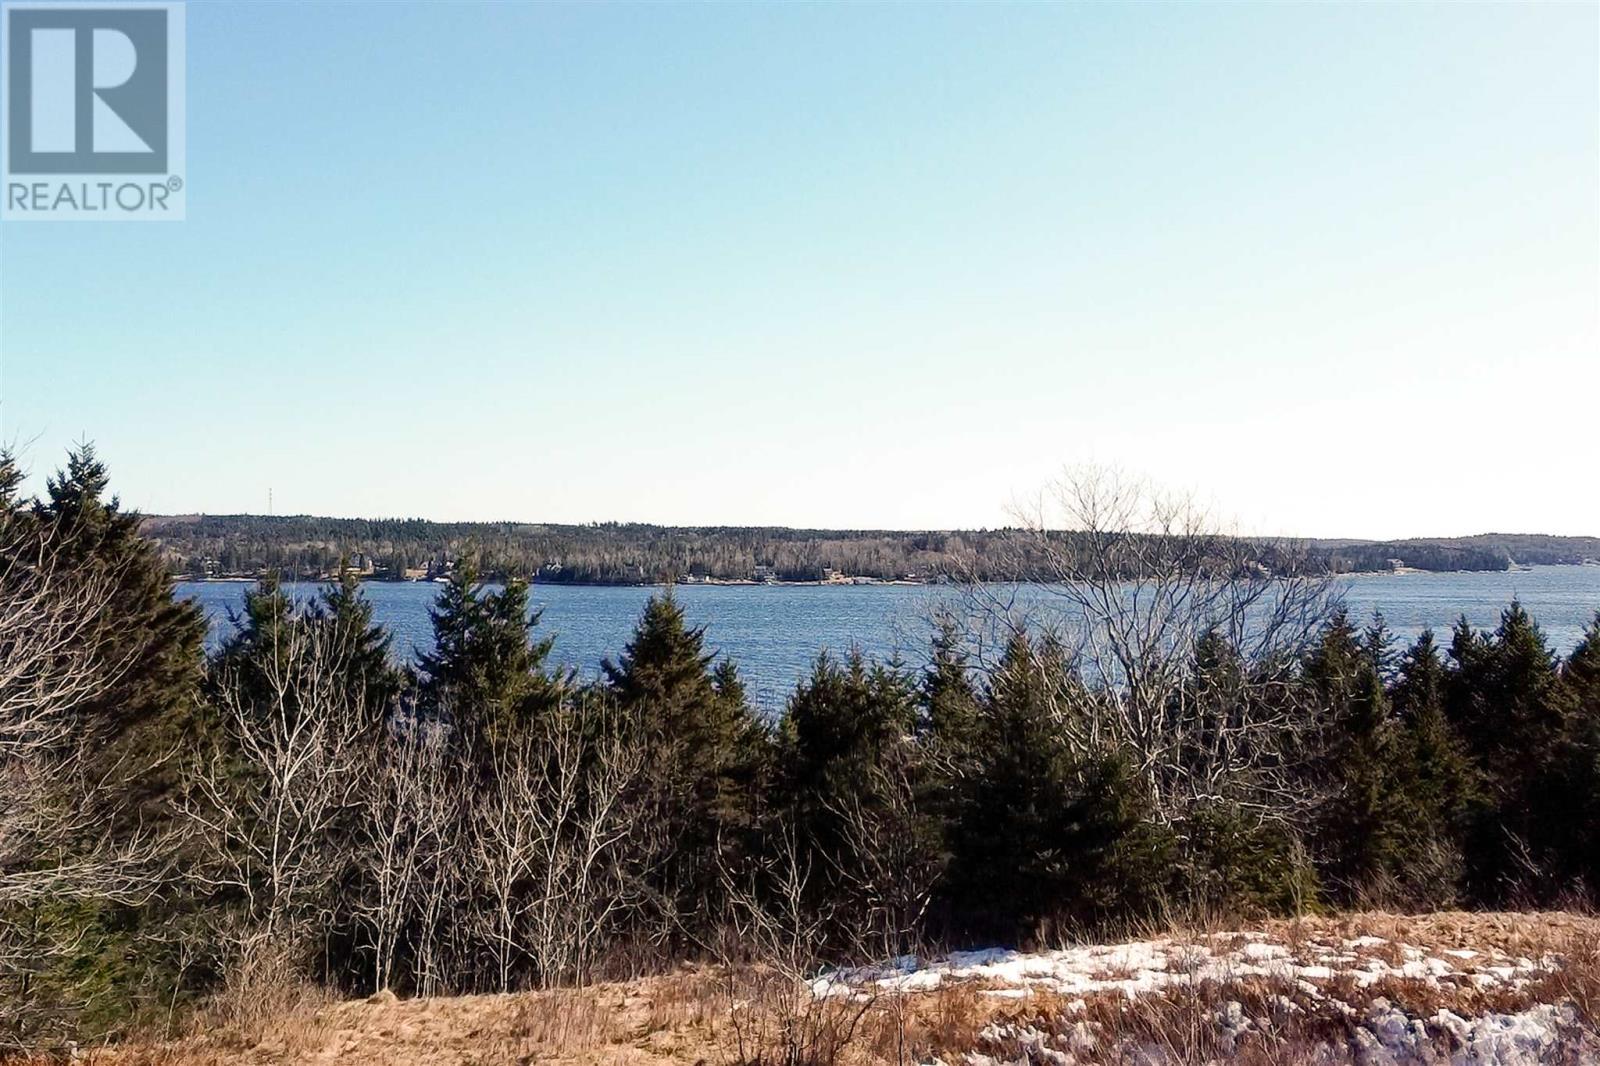 Lot B 293 Hillside Drive, Boutiliers Point, Nova Scotia  B3Z 1W9 - Photo 1 - 202106634